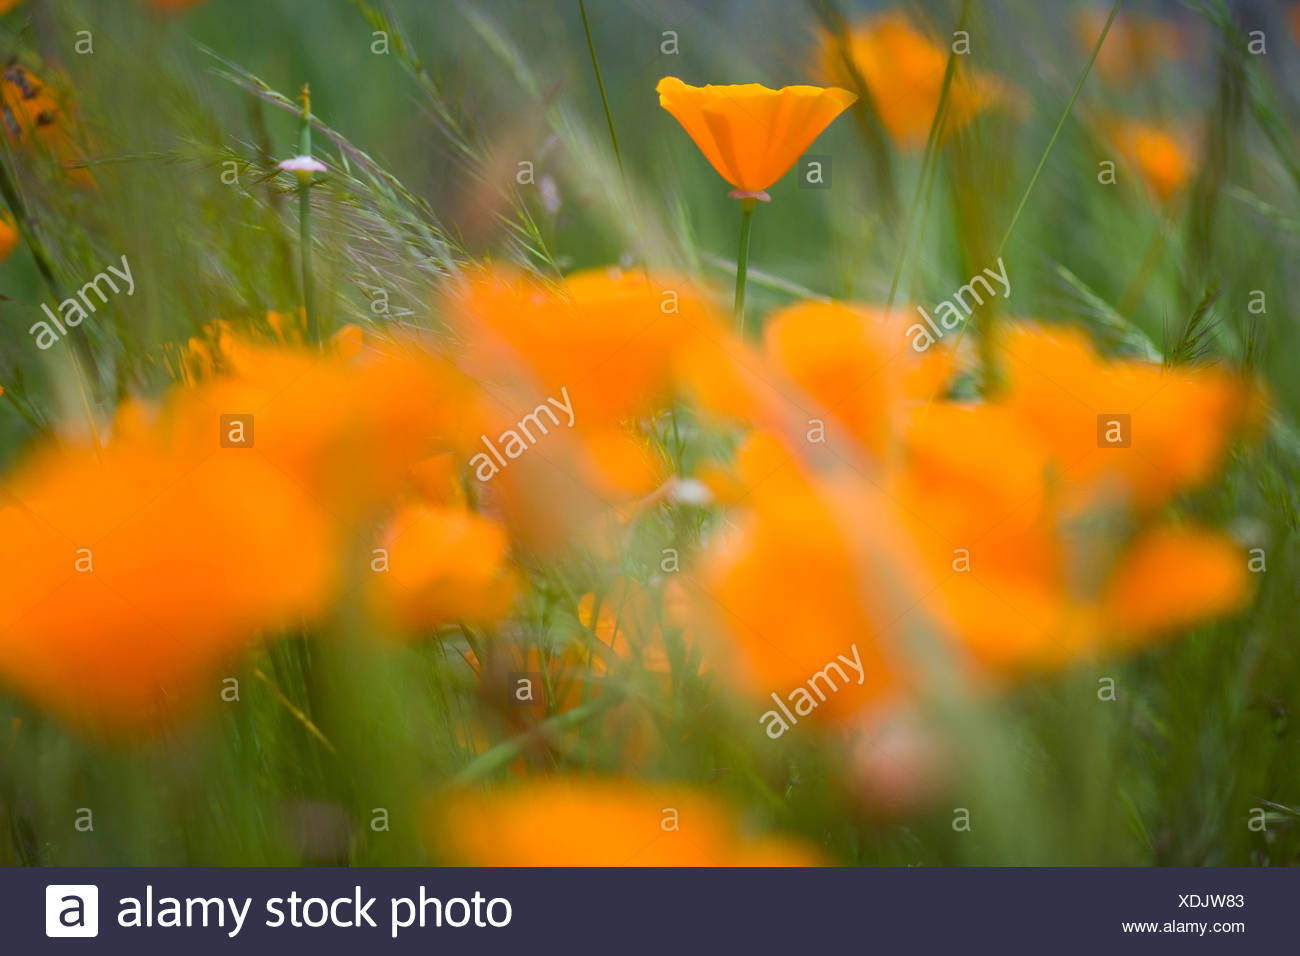 Close Up Of Orange Poppy Flowers Stock Photo 283771379 Alamy